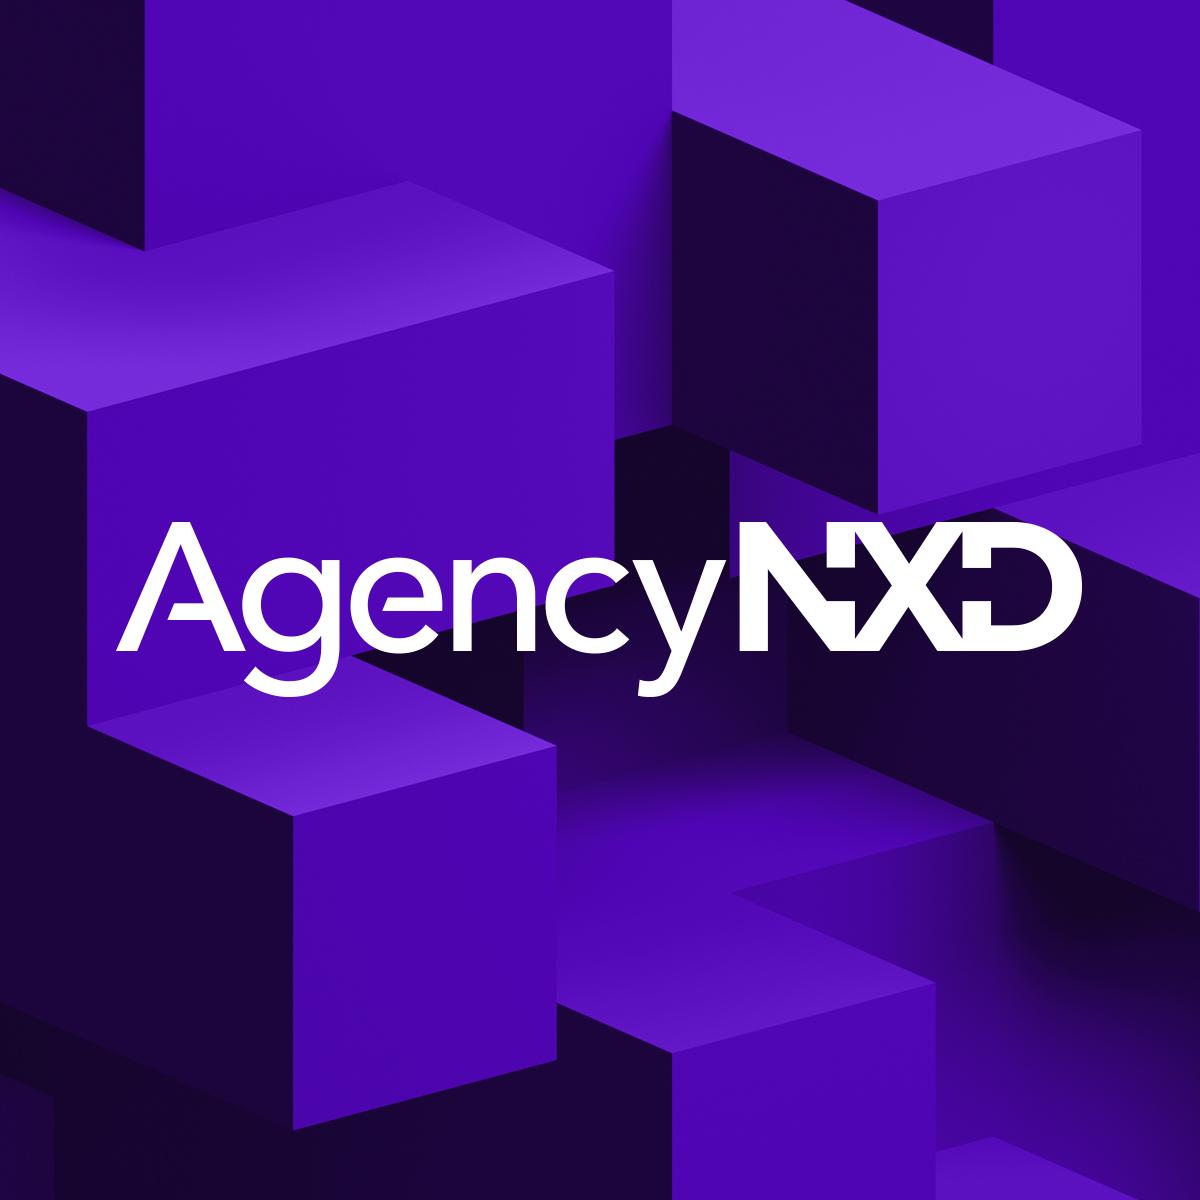 Agency NXD